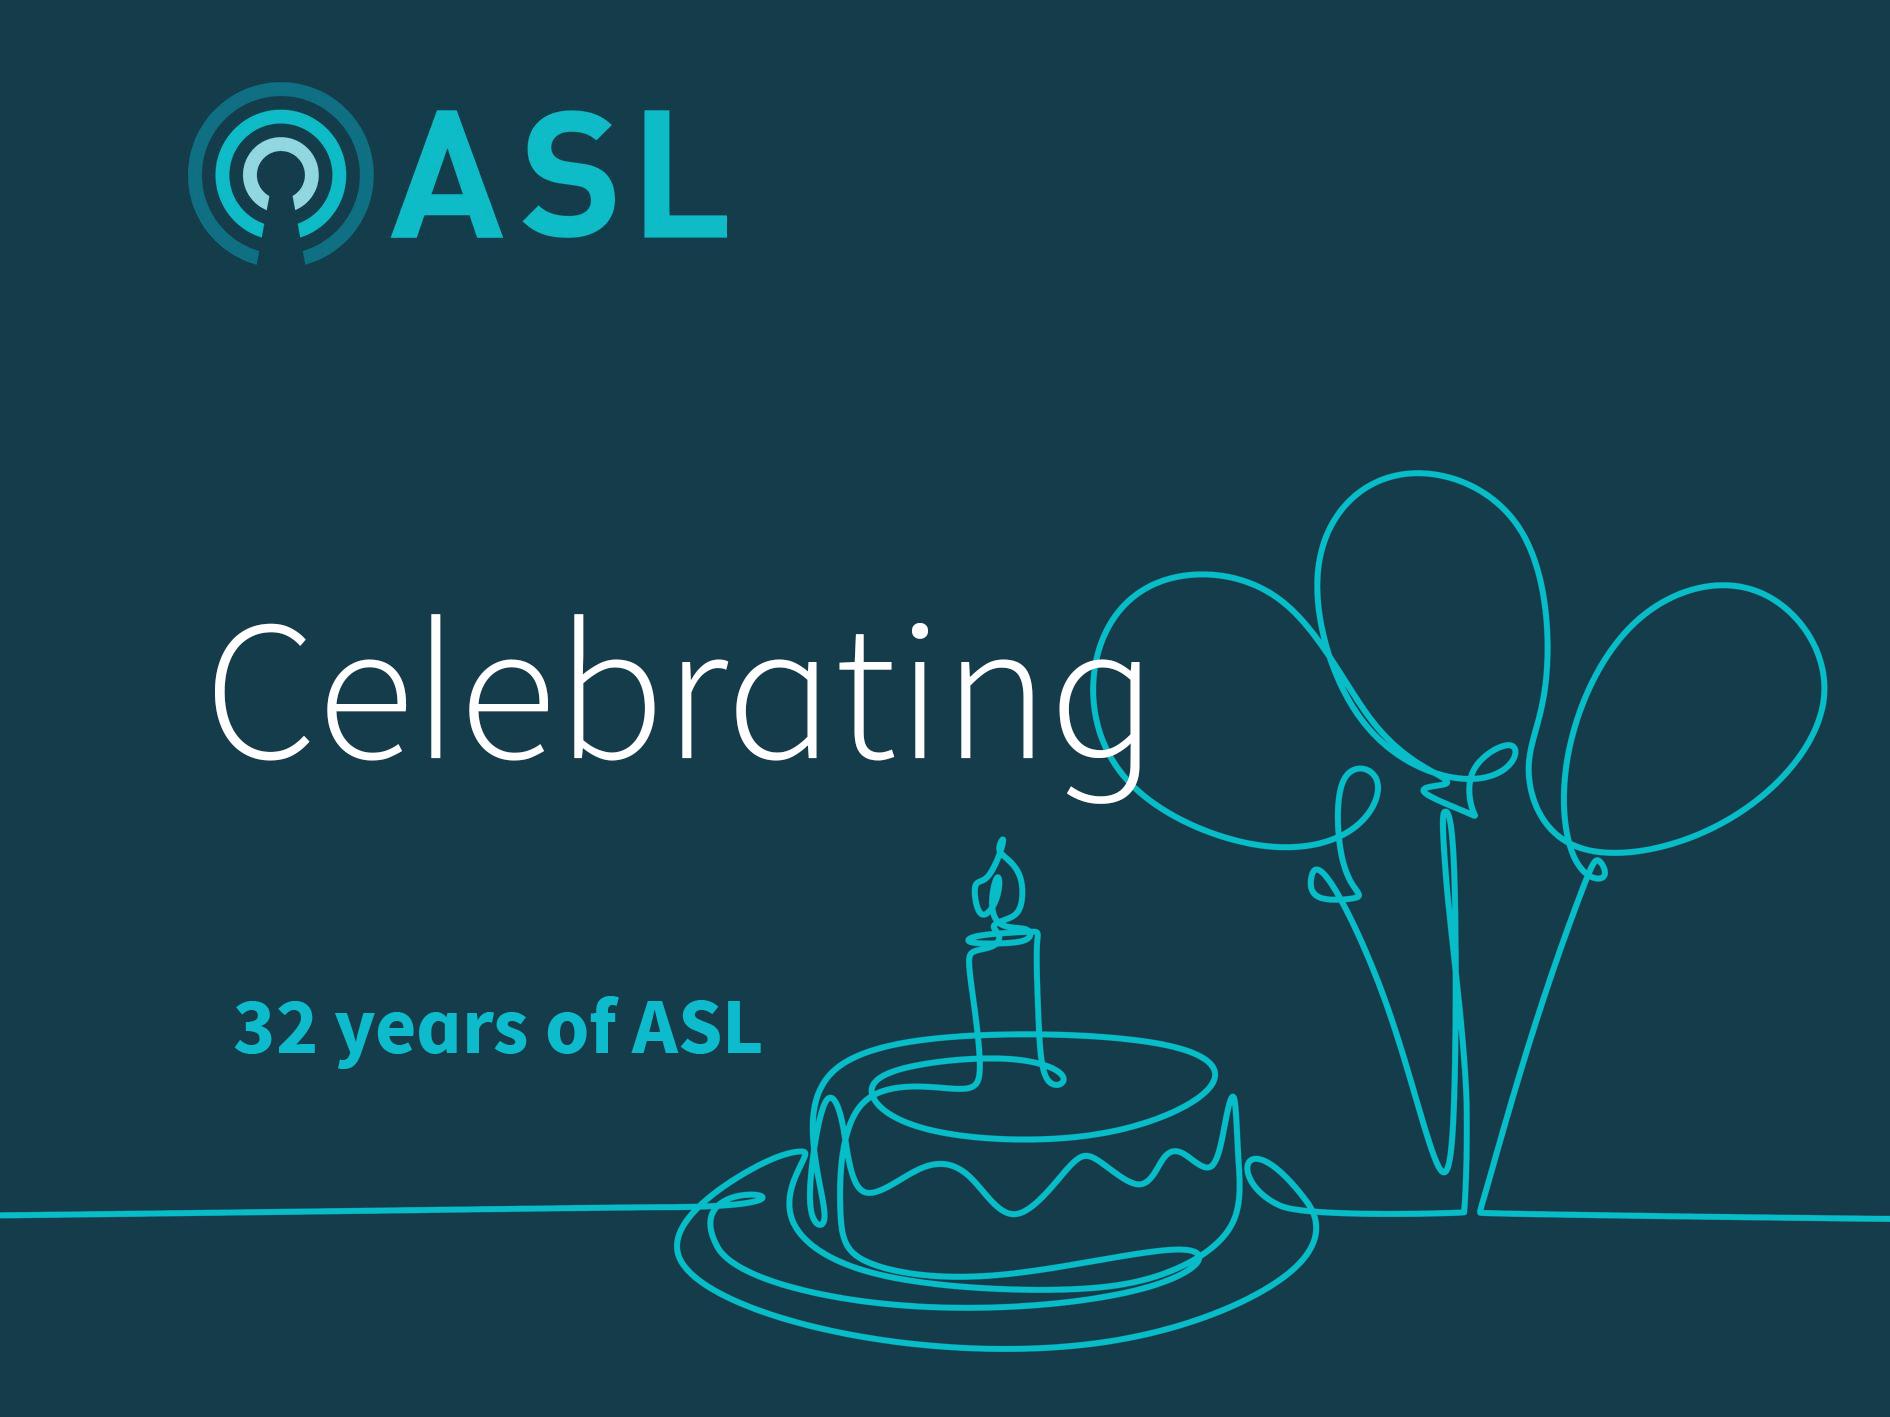 ASL's birthday